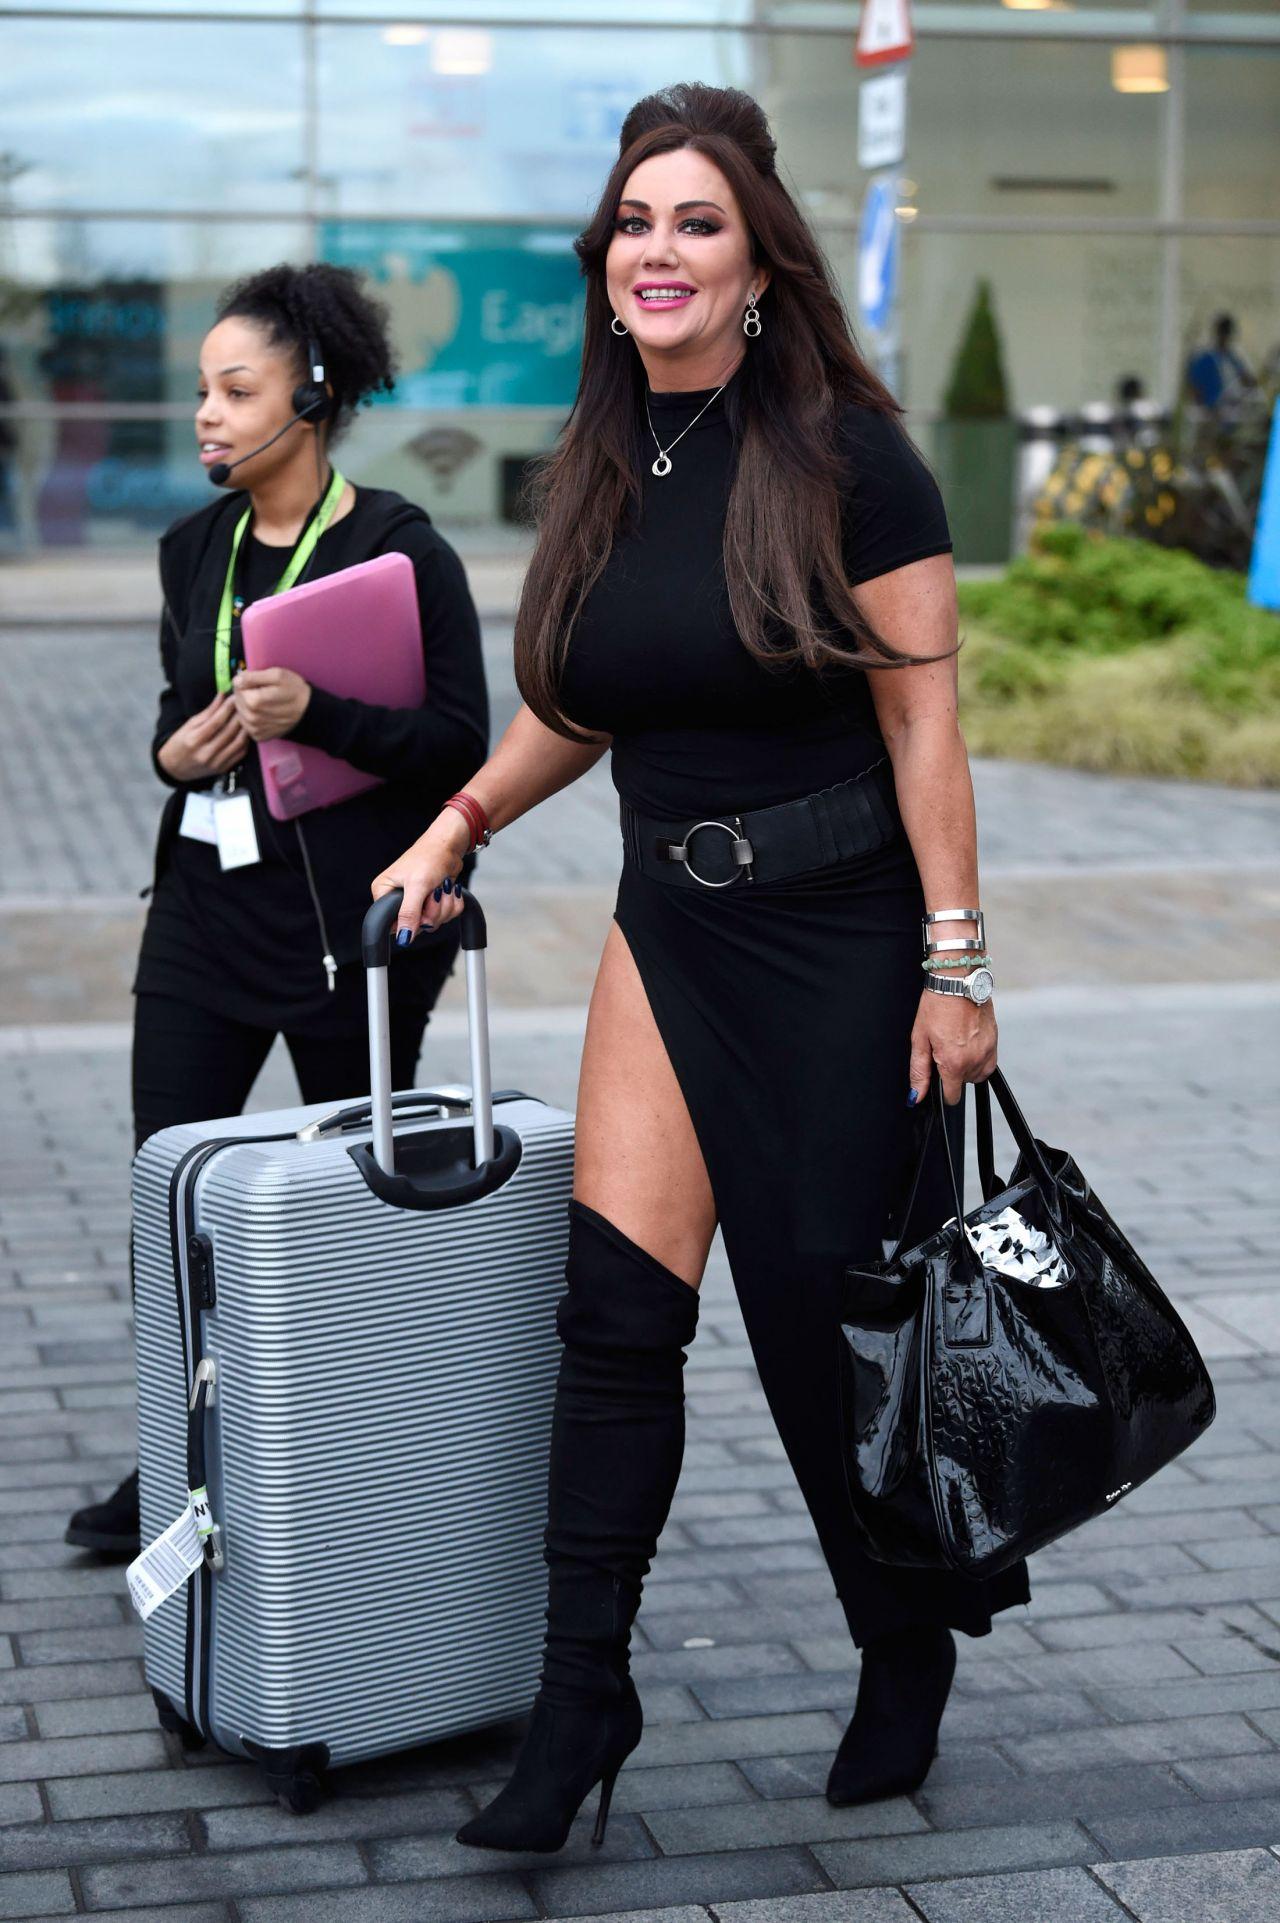 Lisa Appleton Amp Lisa Jeynes Leaving The Jeremy Kyle Show At Media City In Manchester 3 11 2017